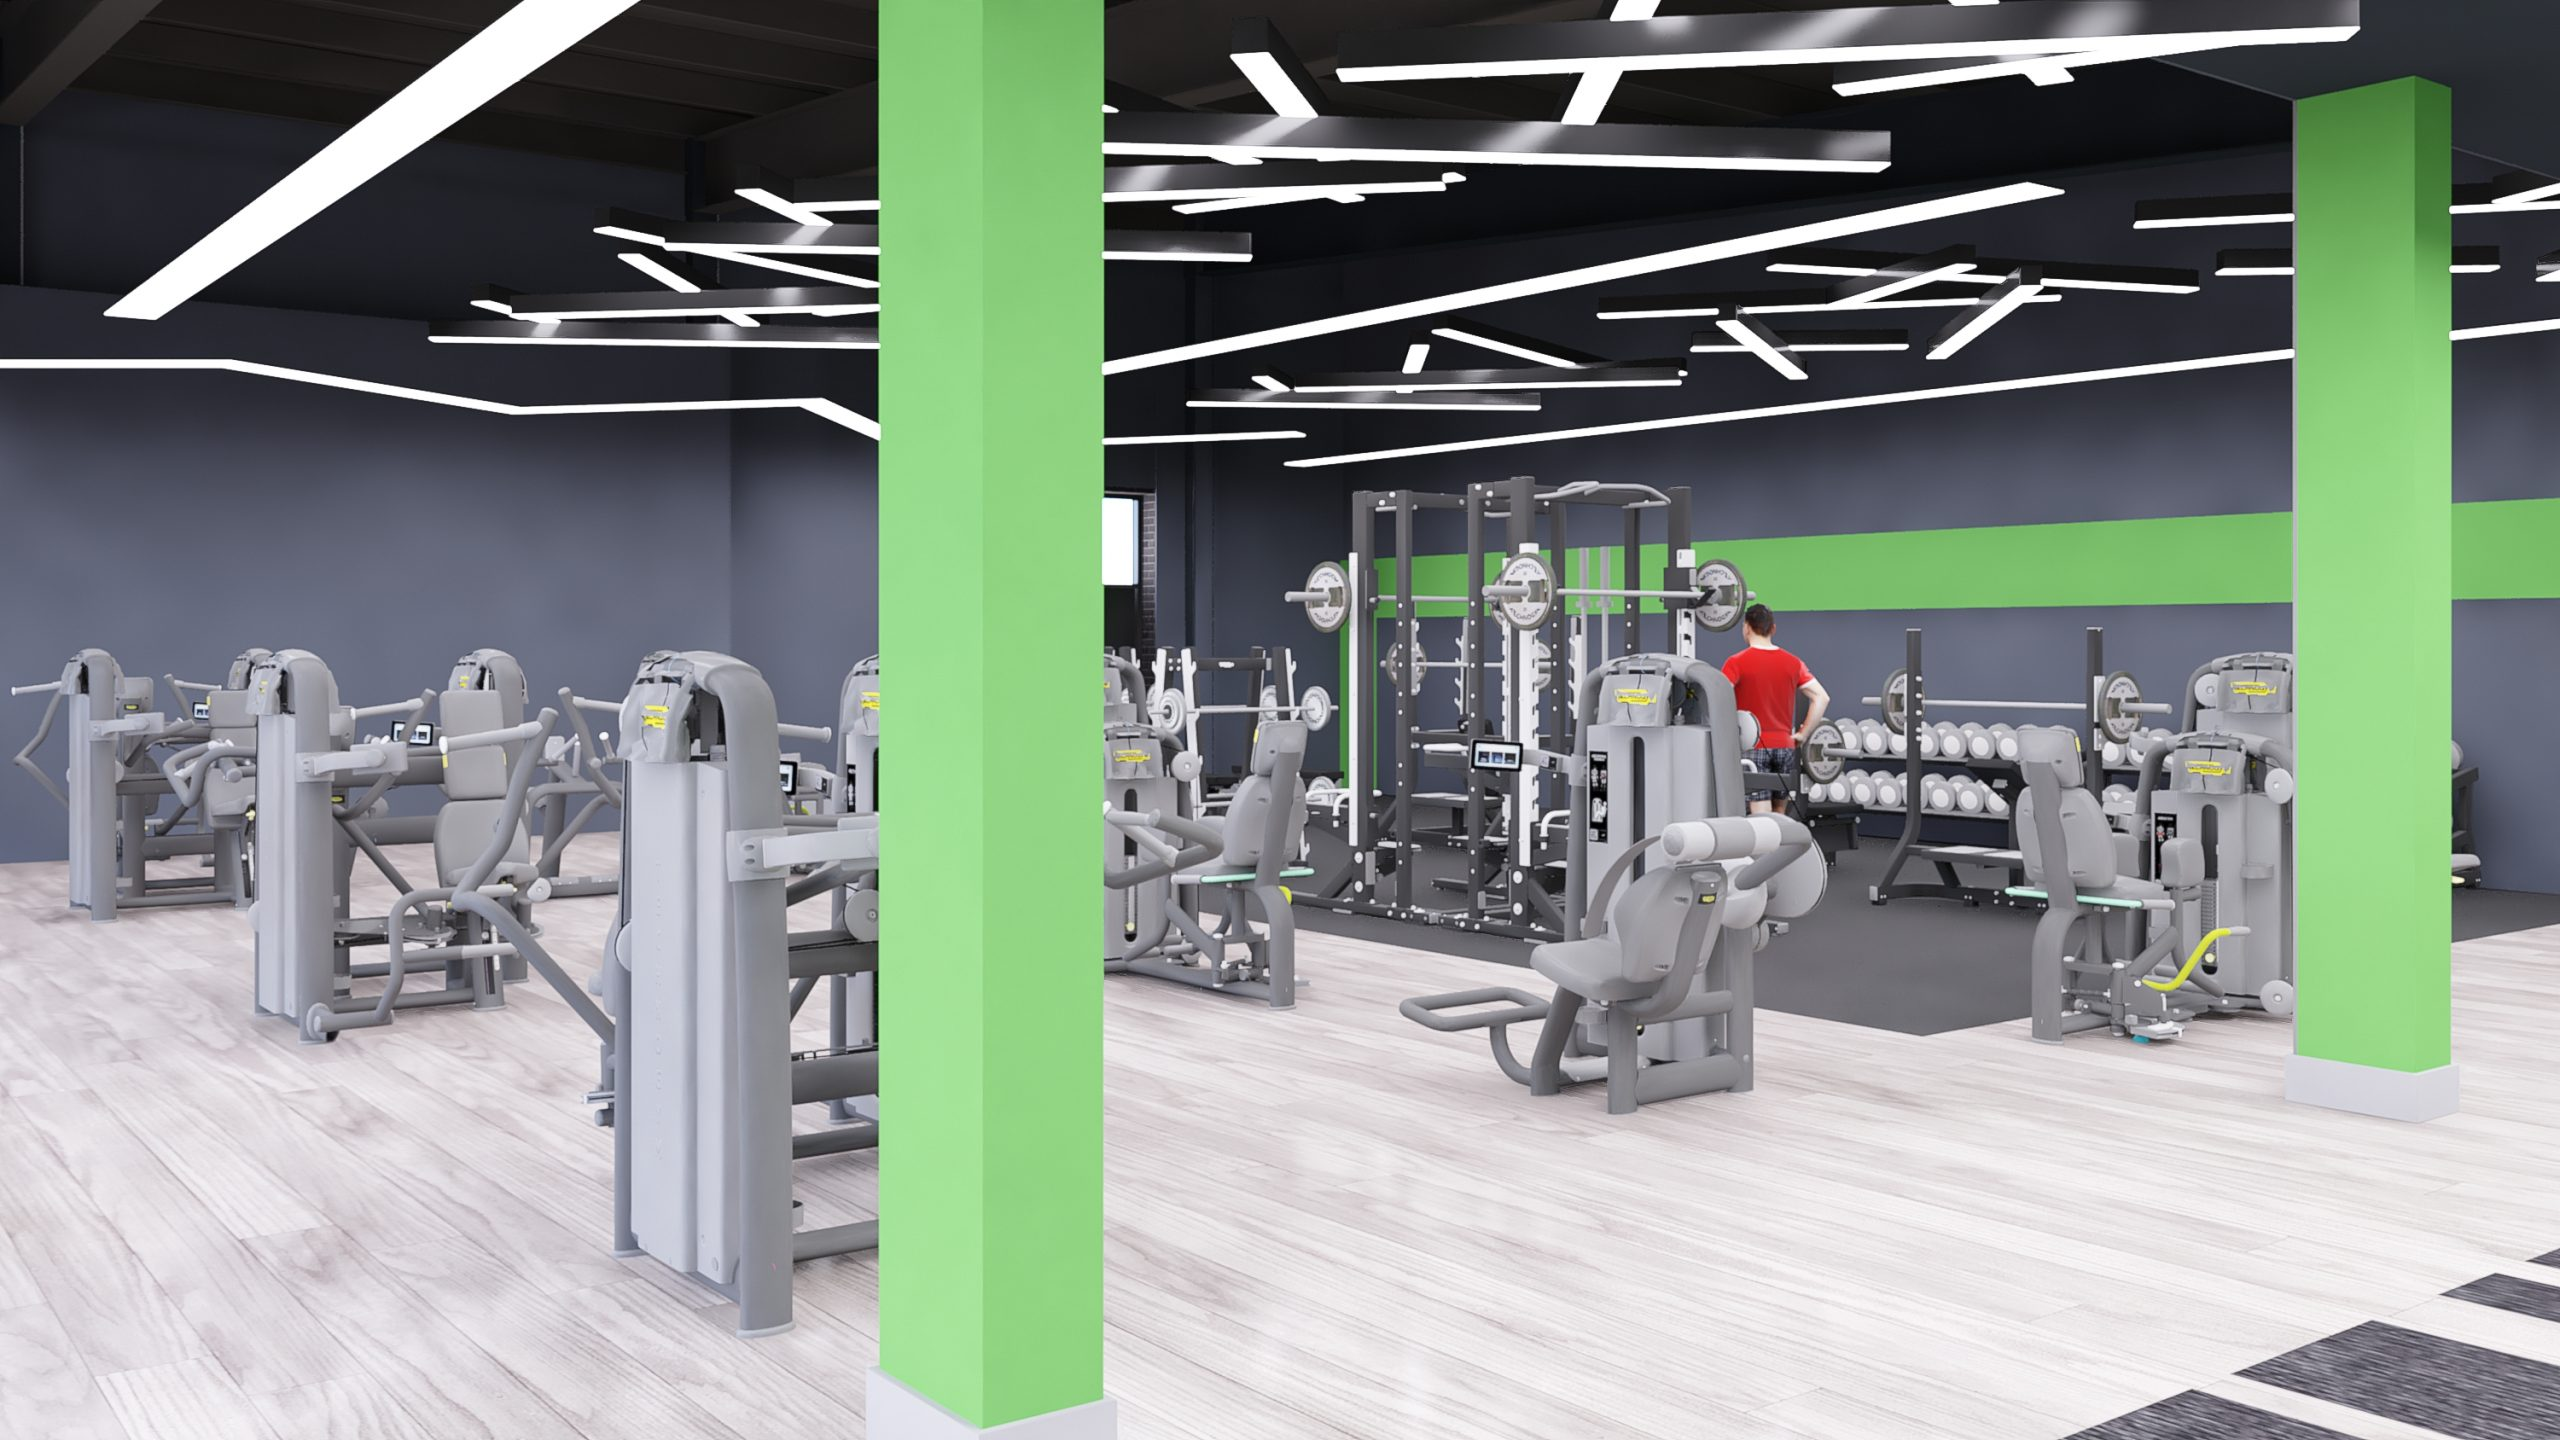 Northfield Pool Gym-02